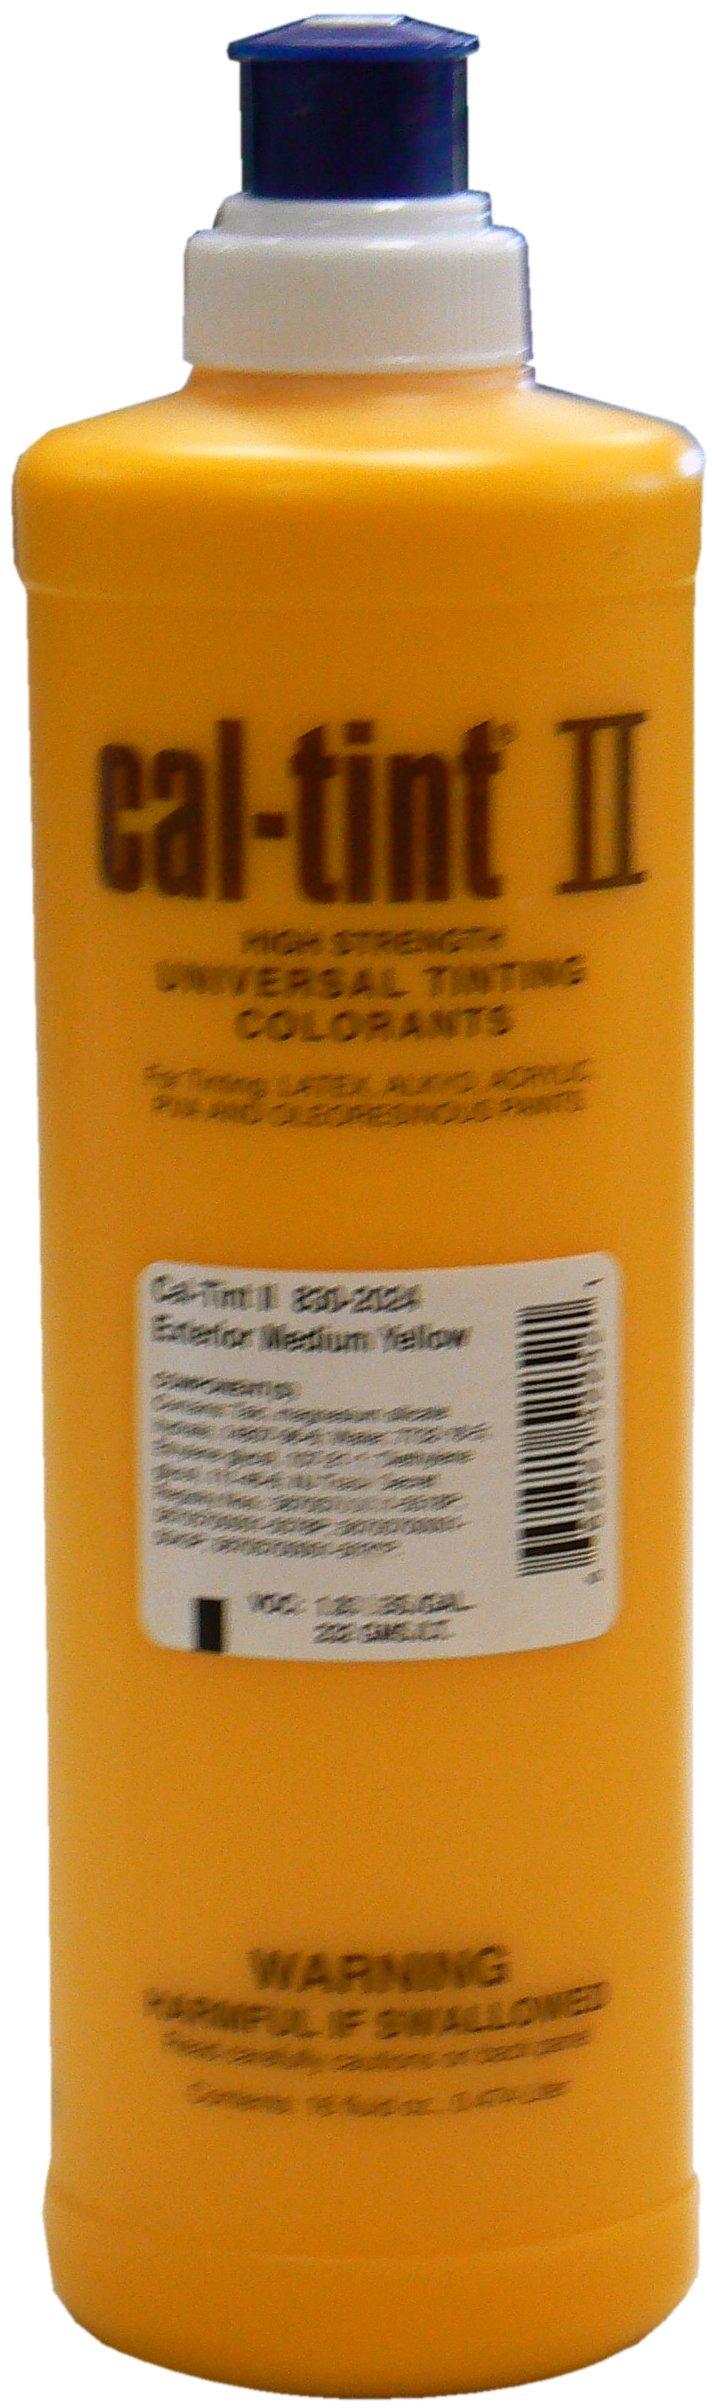 Chromaflo 830-2024 Cal-Tint II 16-Ounce Colorants, Medium Yellow